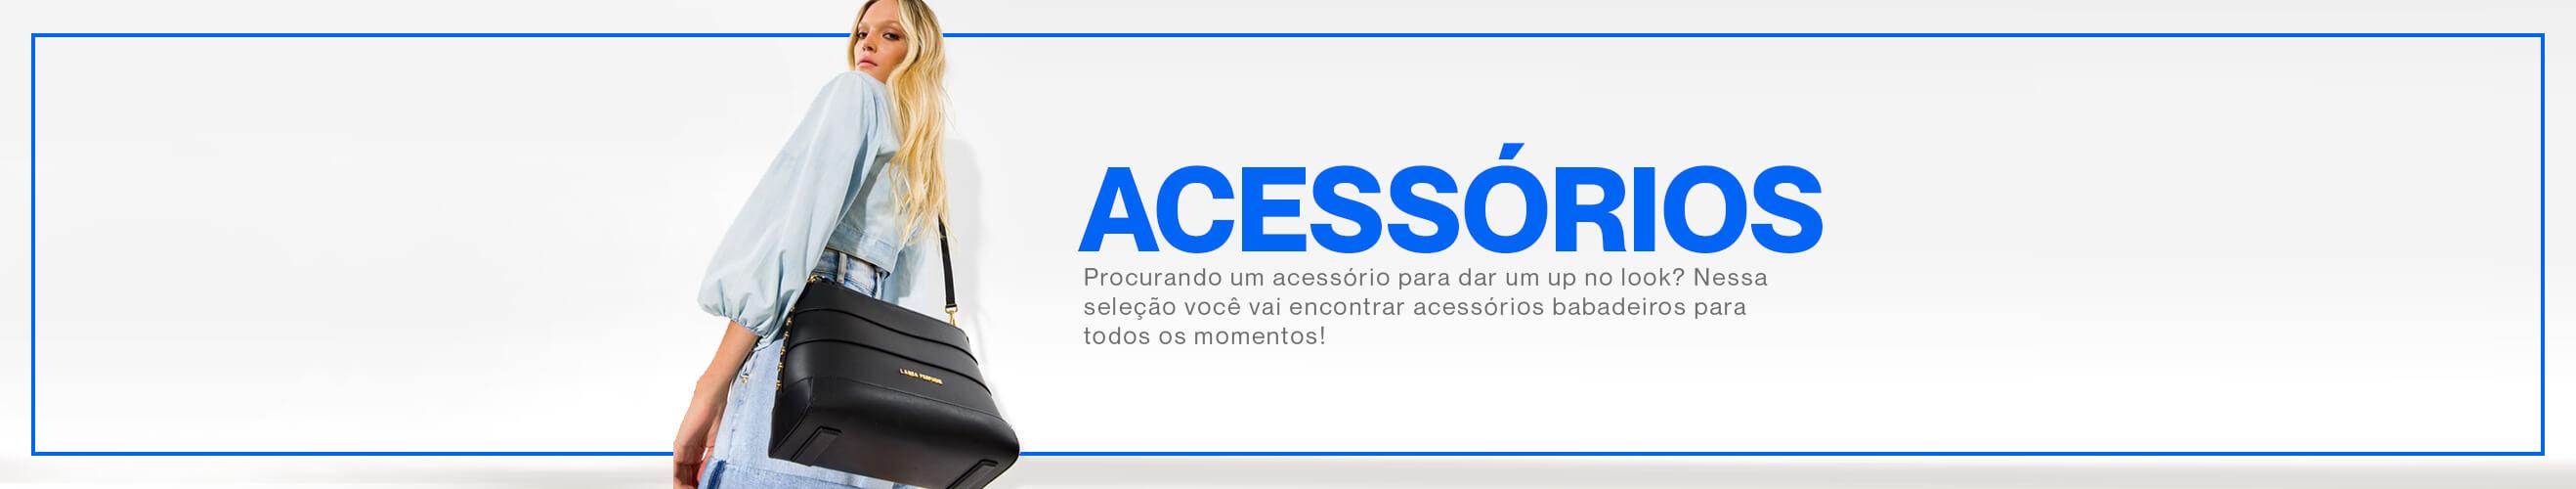 Banner Desktop - Acessórios